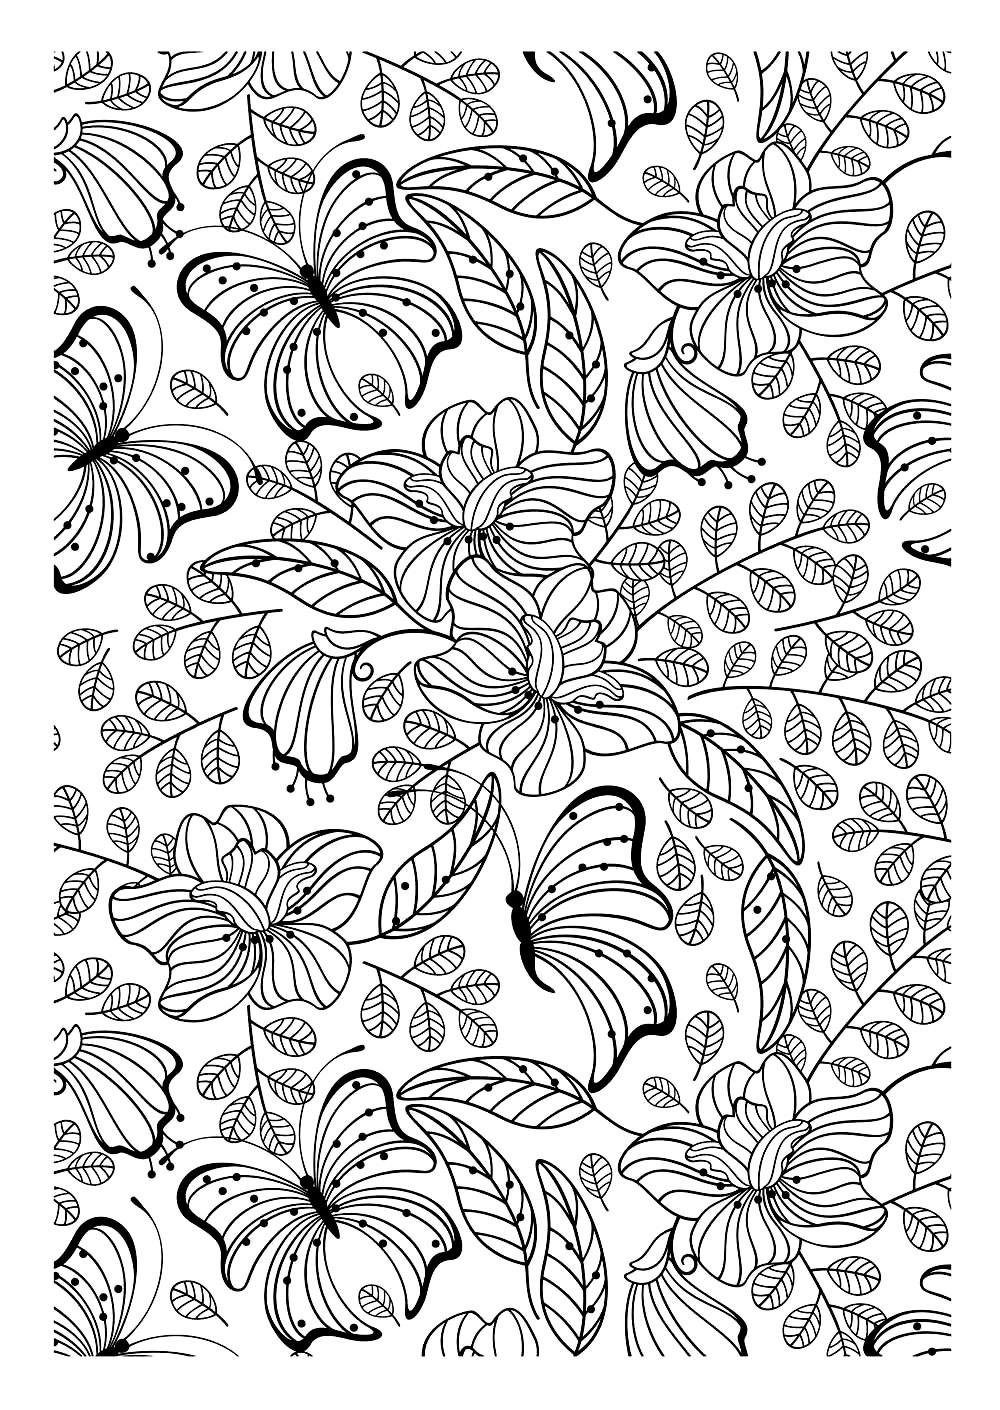 Superbes papillons